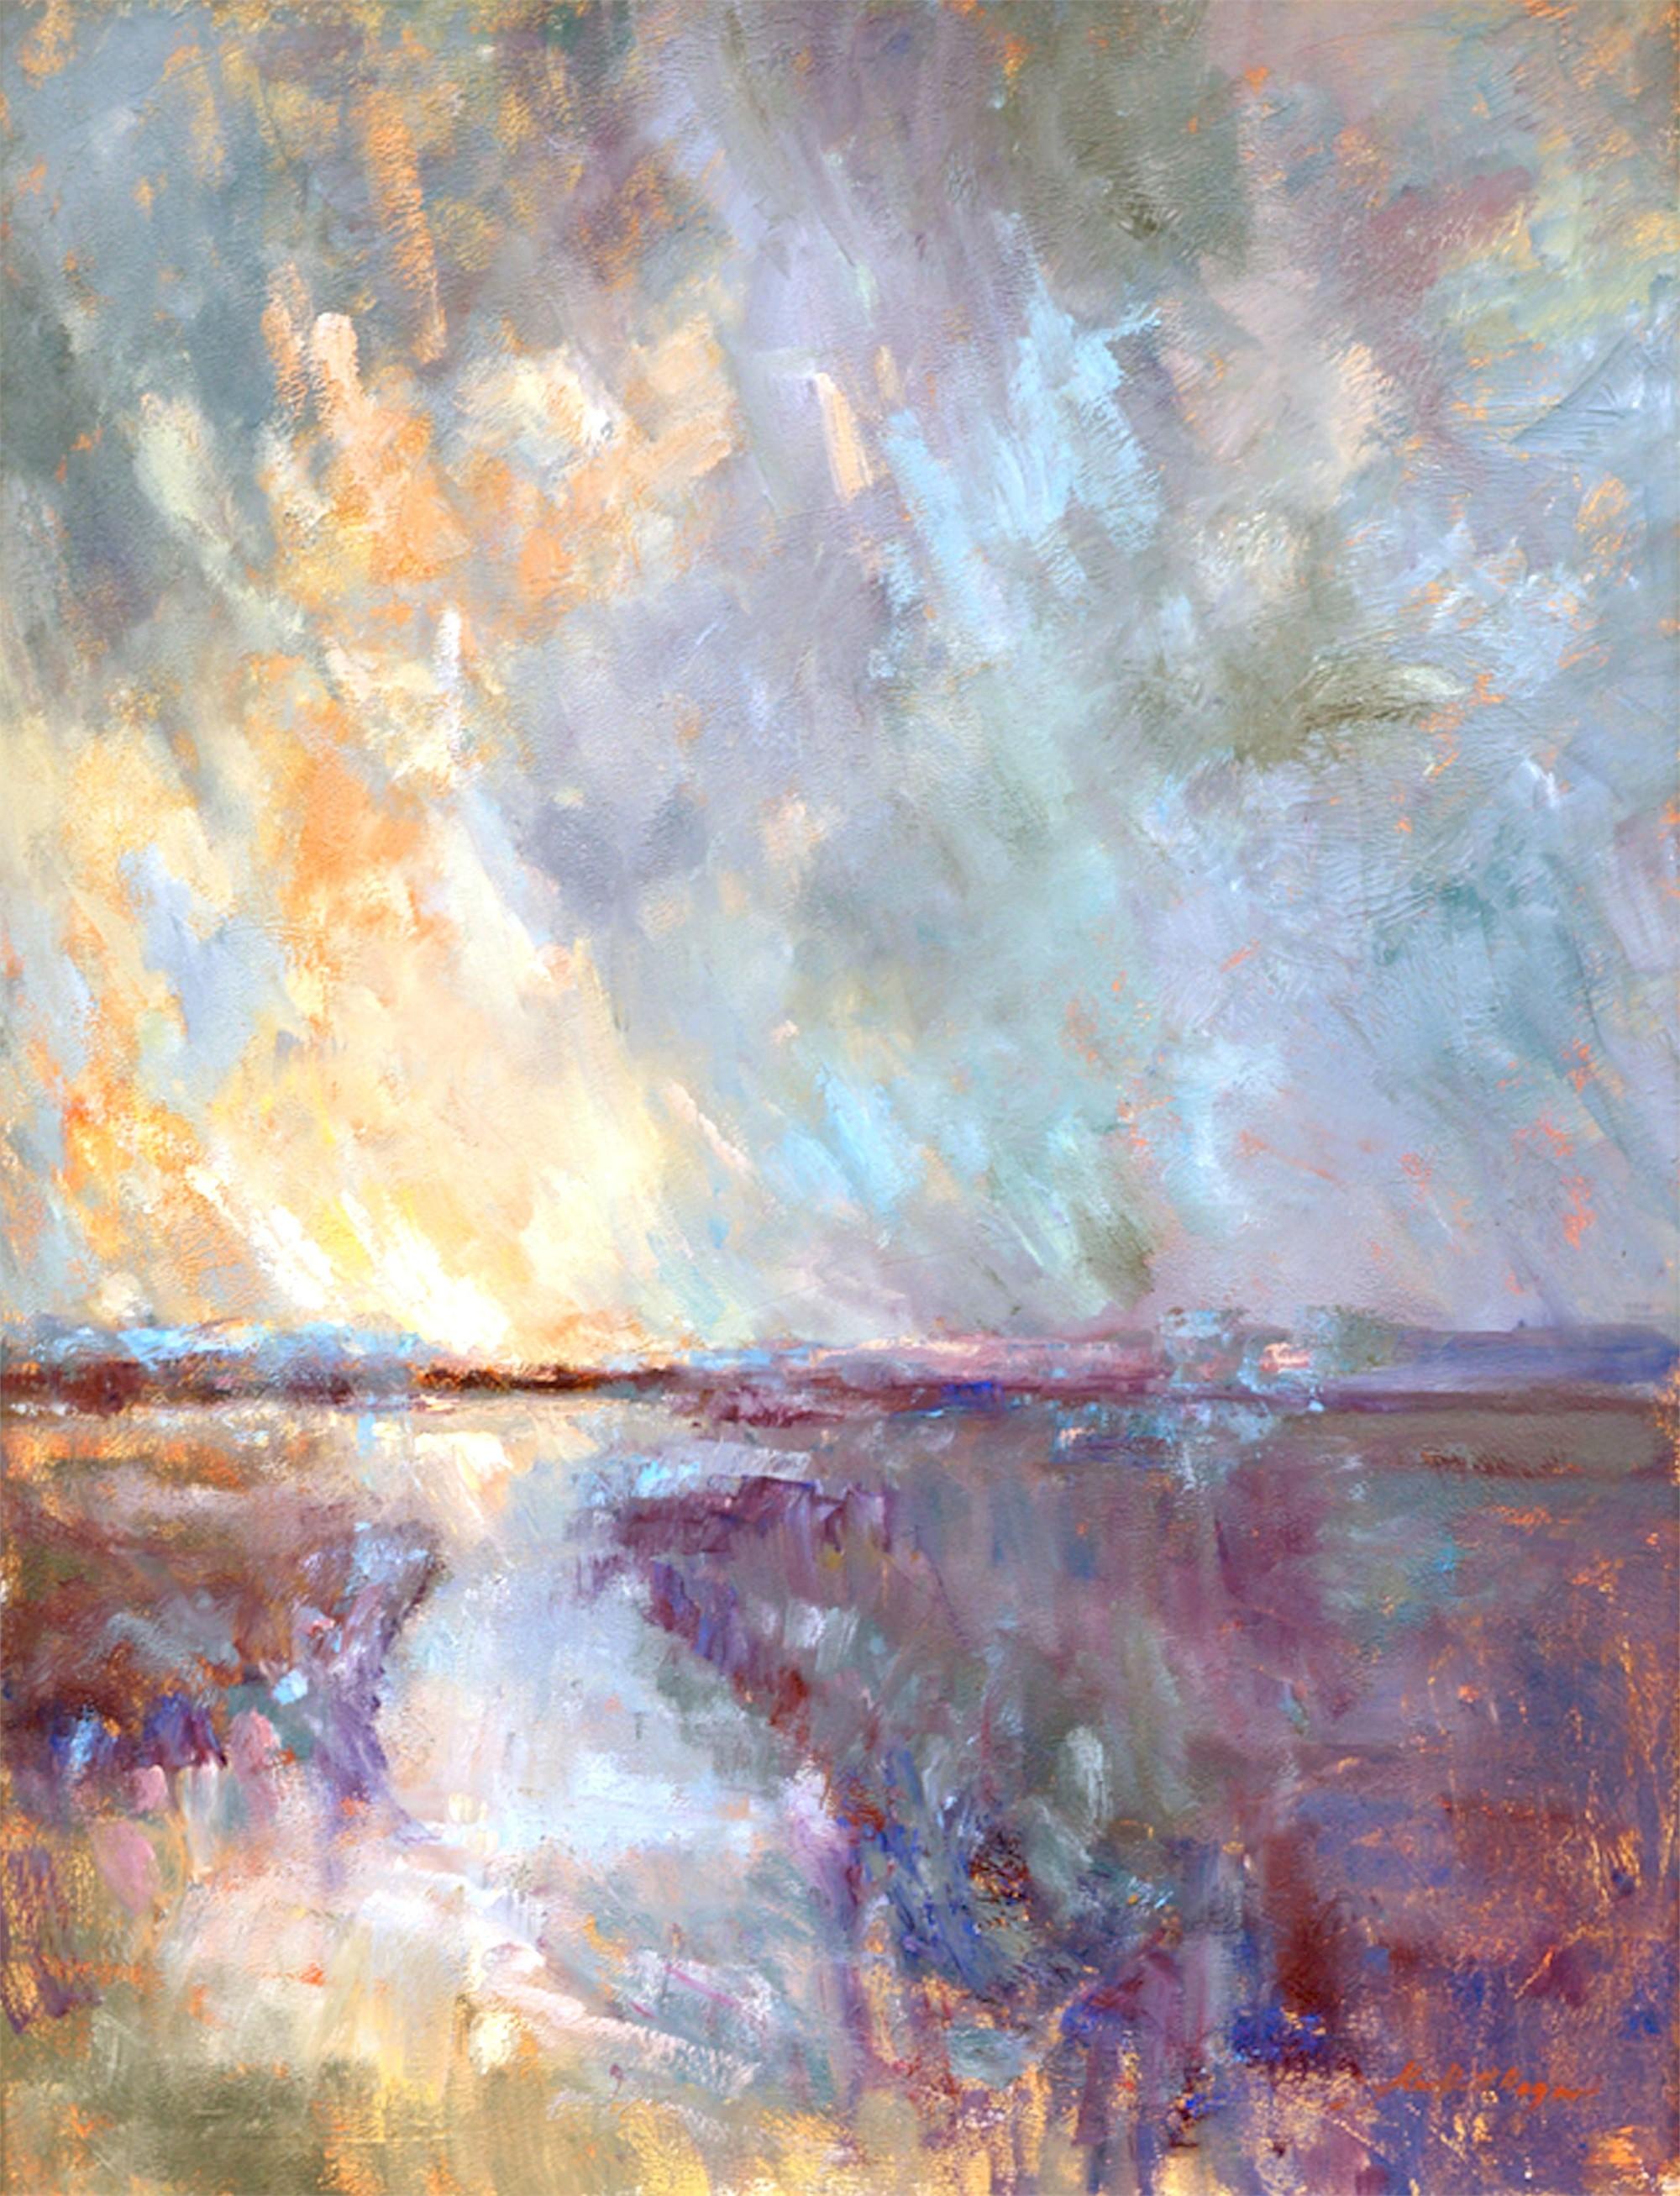 Beneath the Blue Skies by Karen Hewitt Hagan